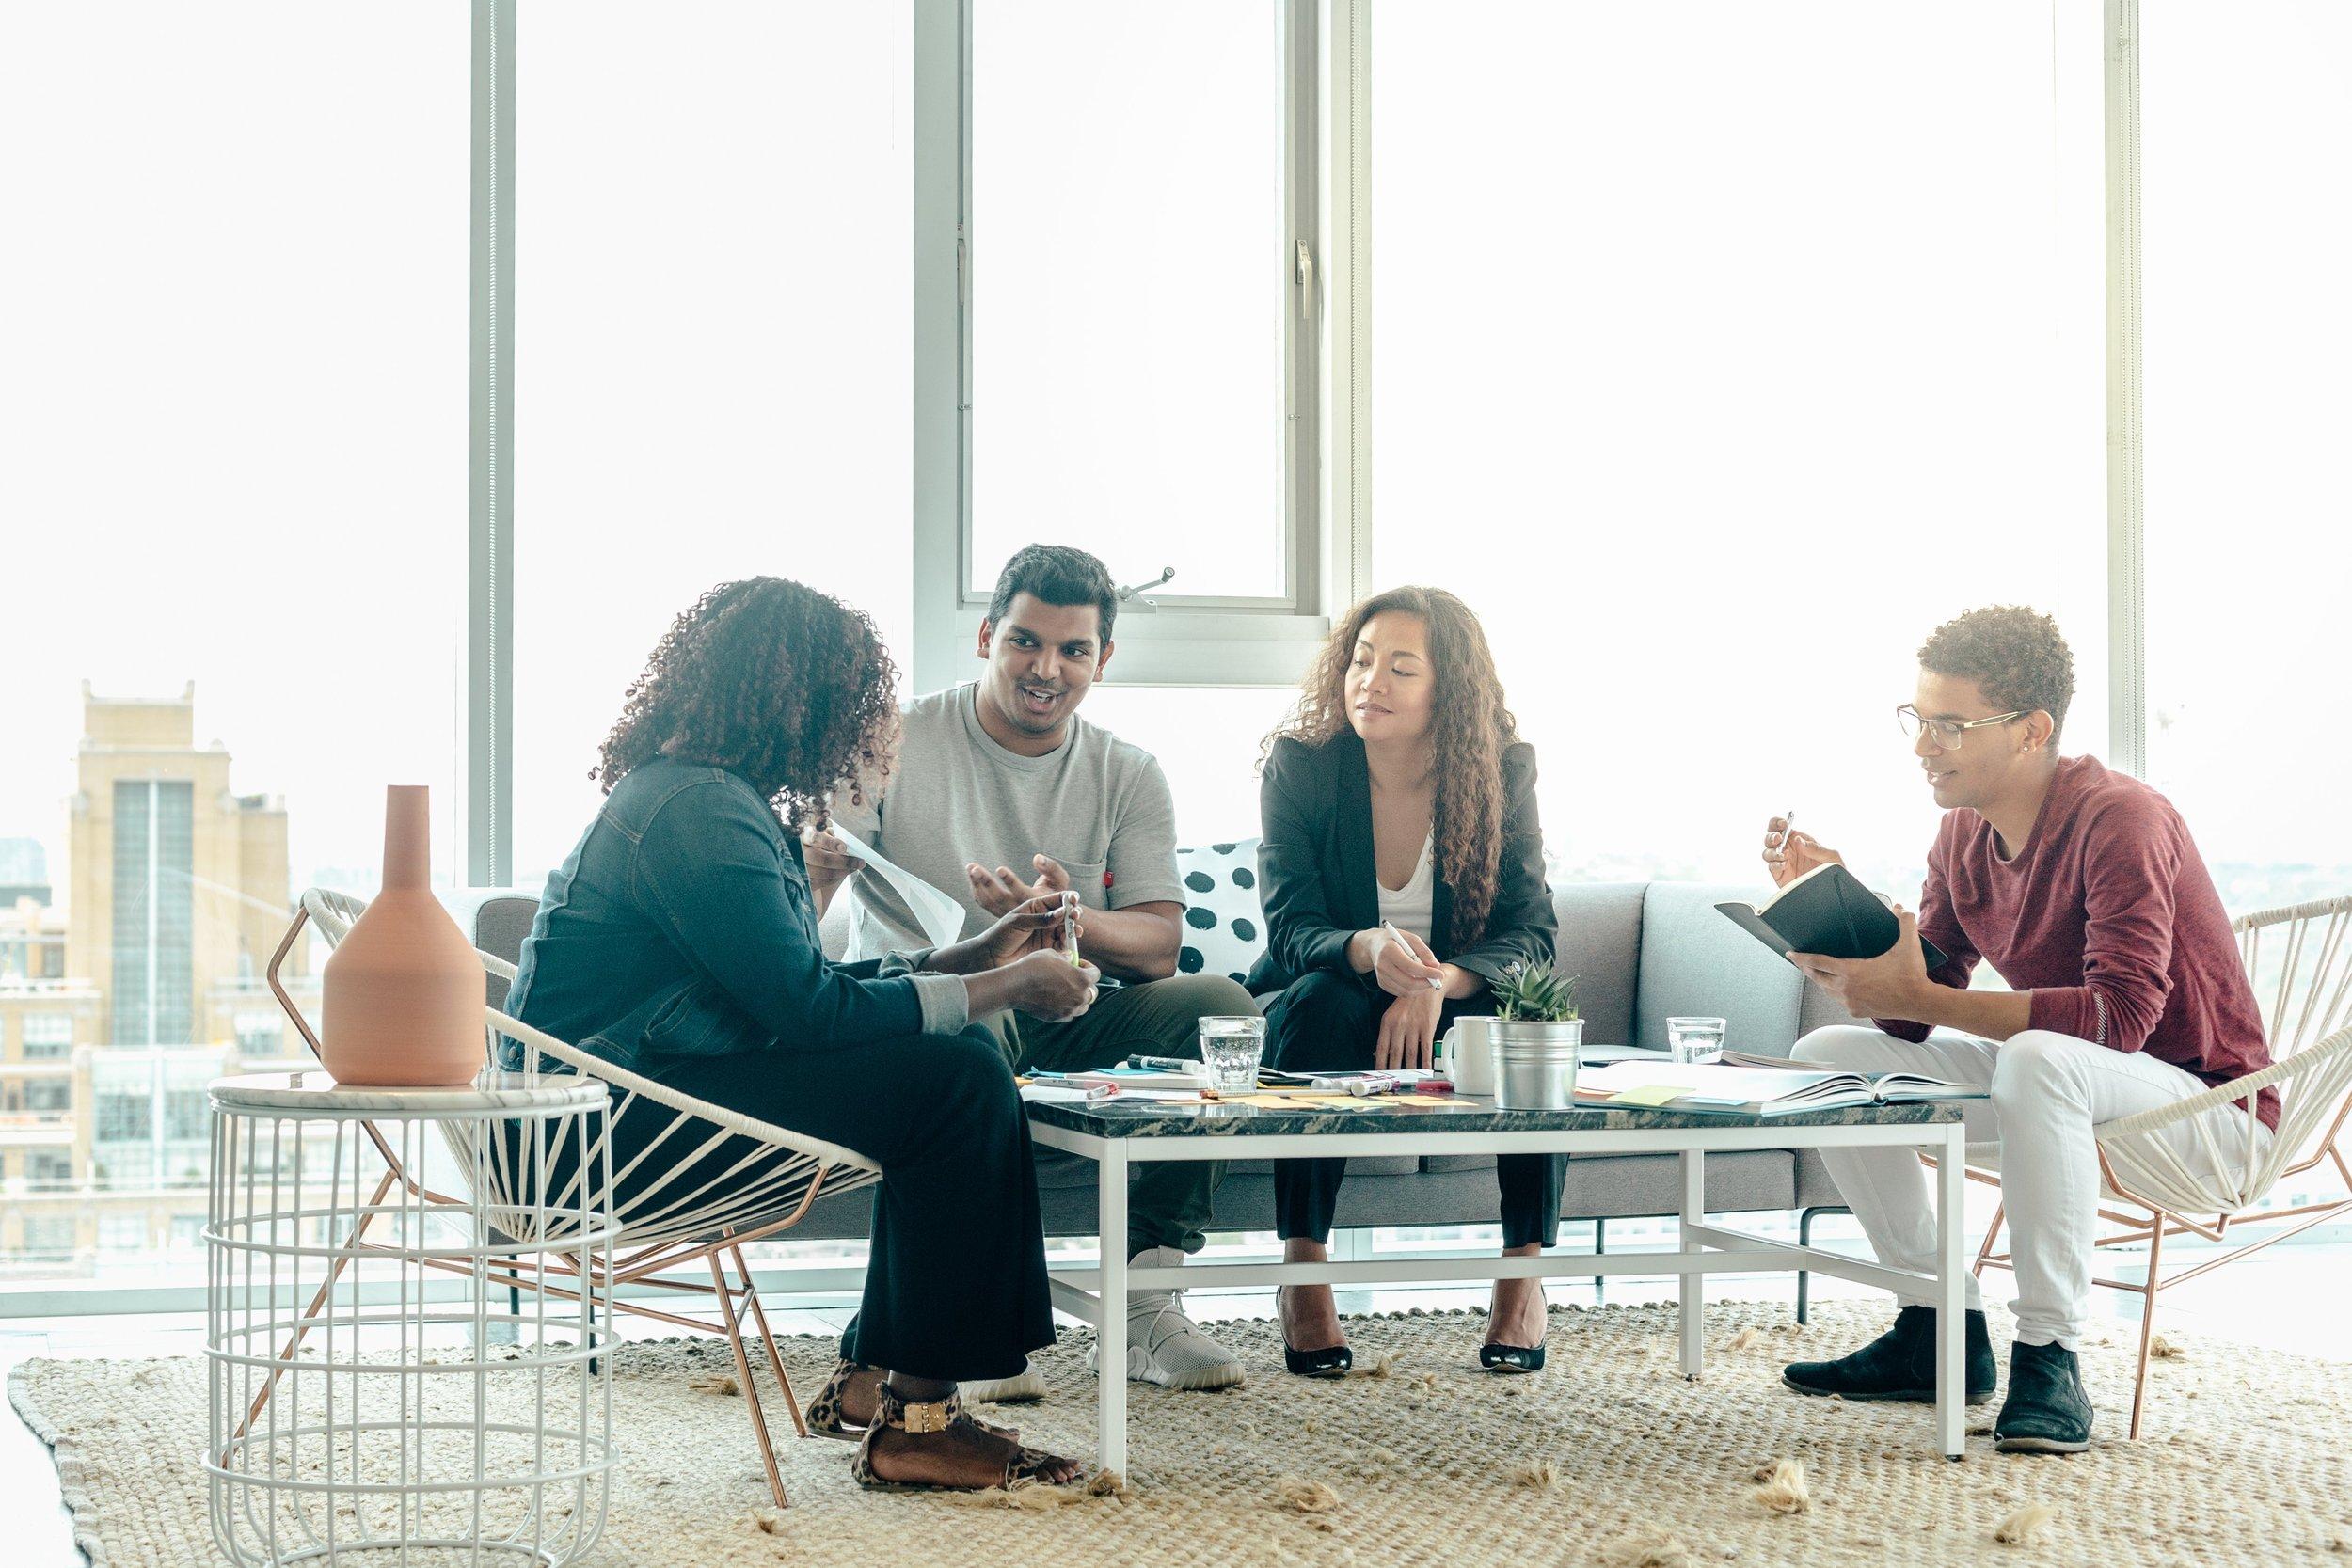 team-brainstorm-meeting-in-bright-sunny-office_4460x4460.jpg